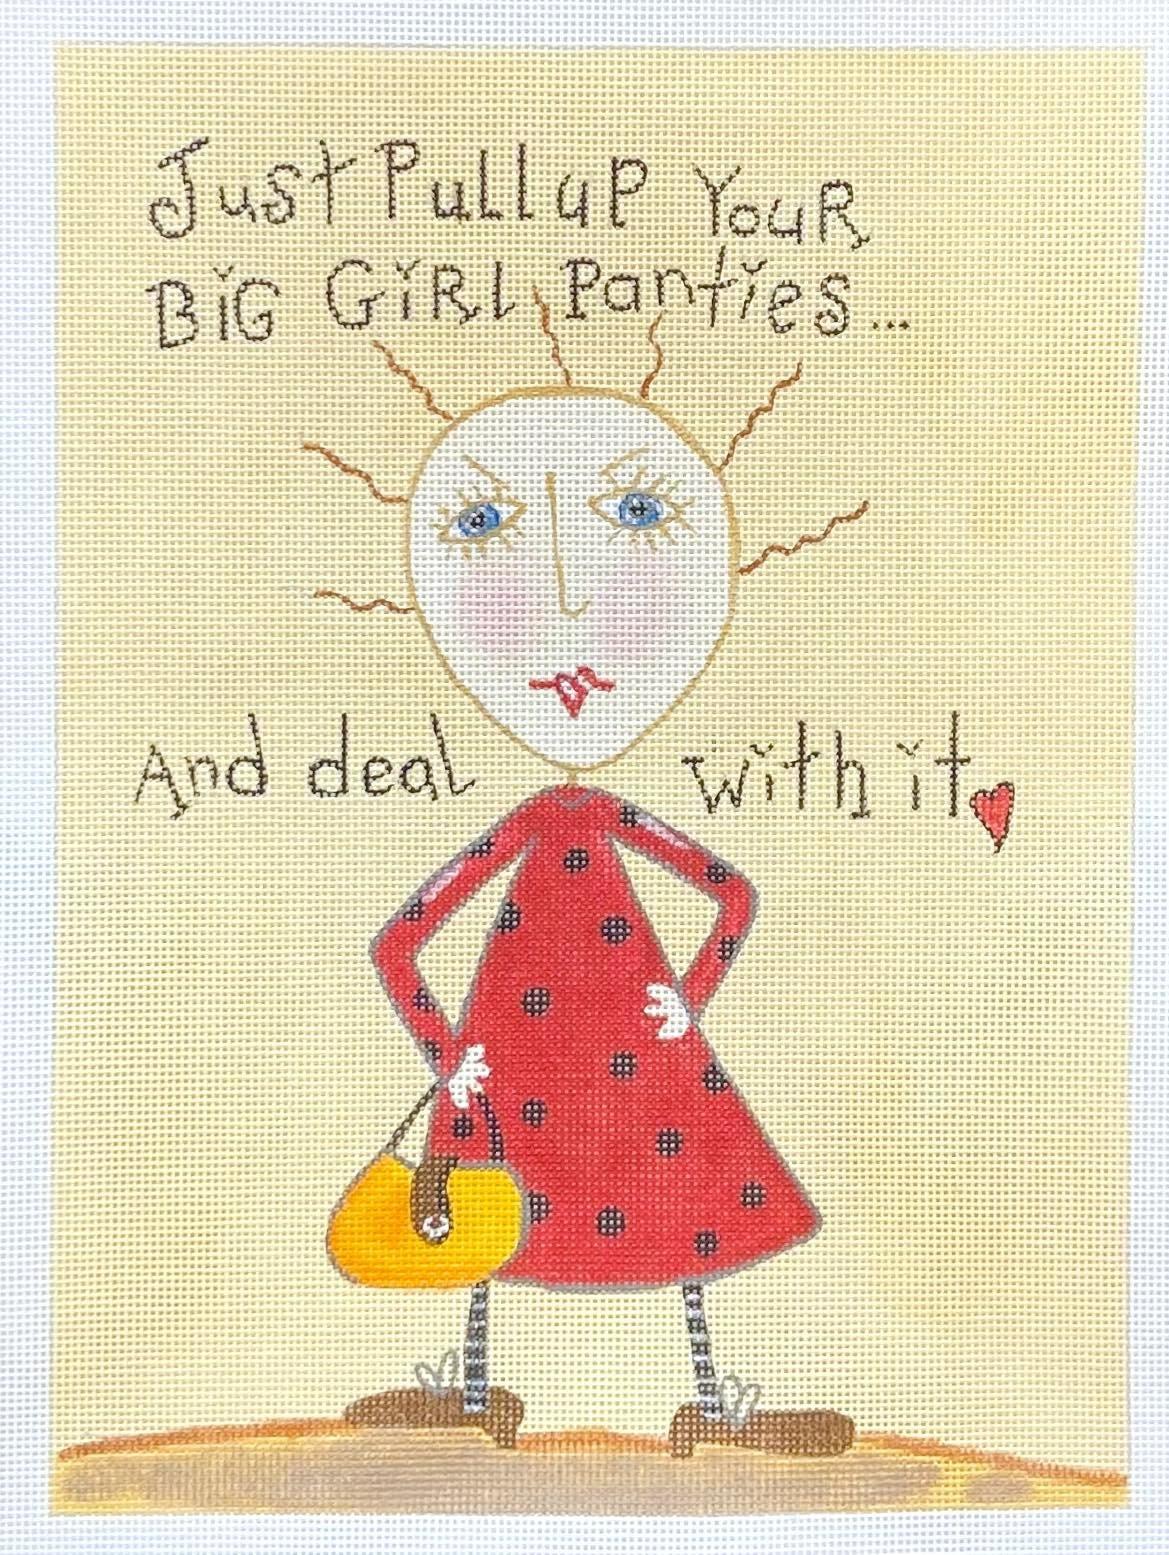 Deal With It © Pam Warden/Applejack Licensing